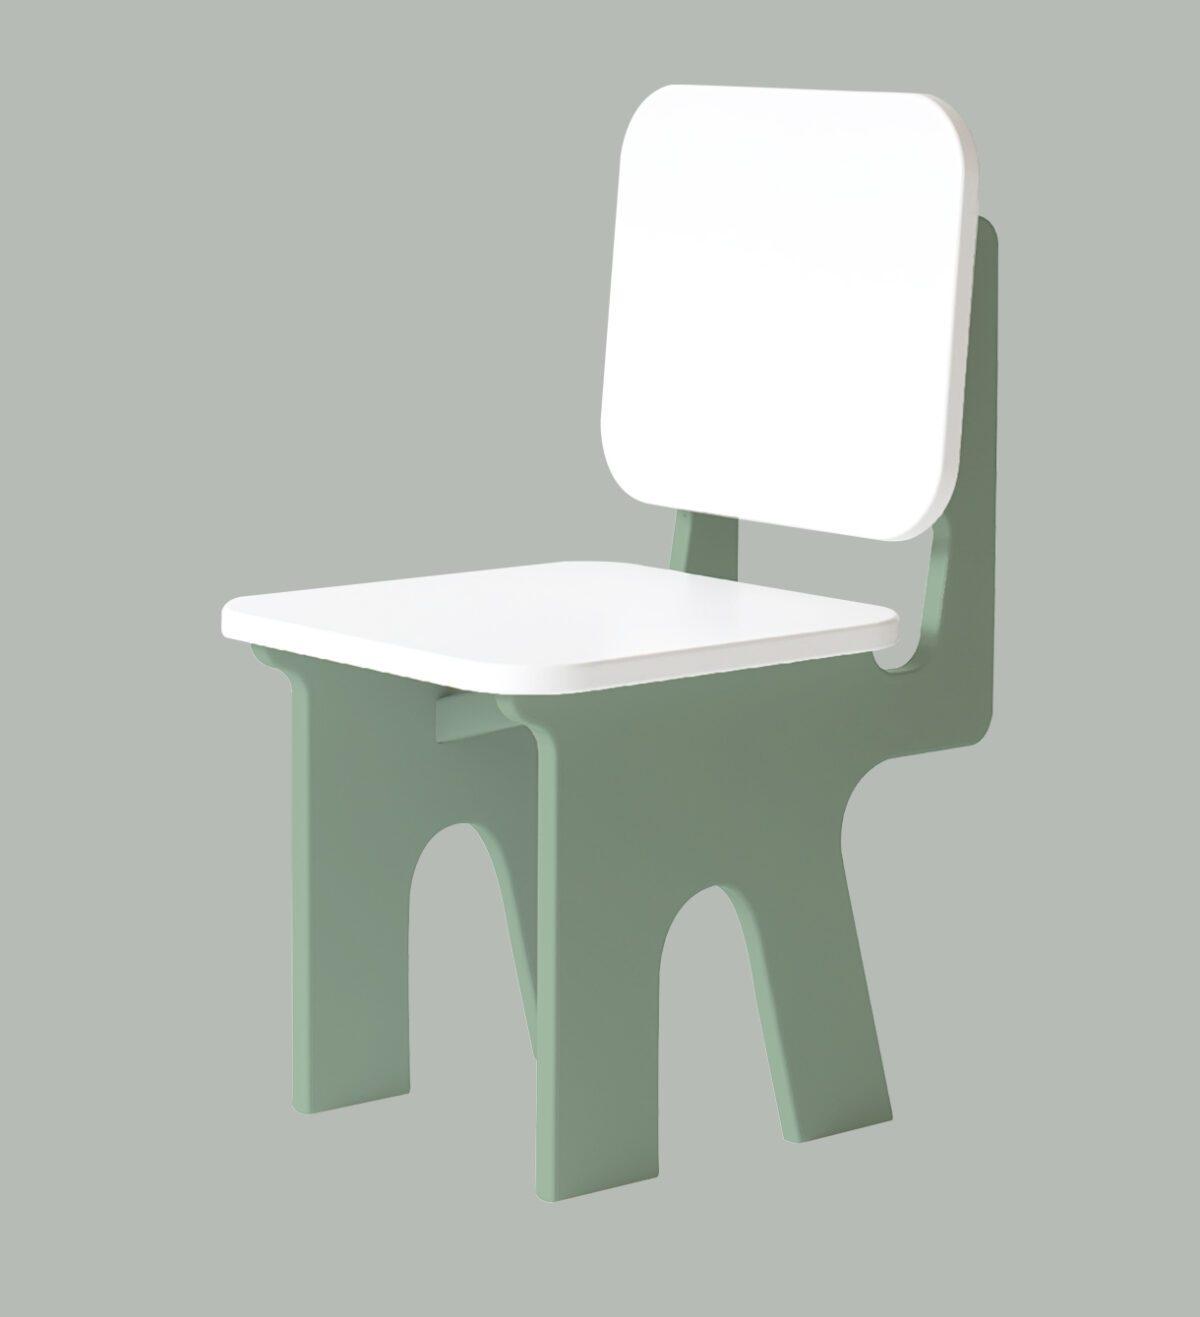 Kinderstoeltje Dipperdee groen